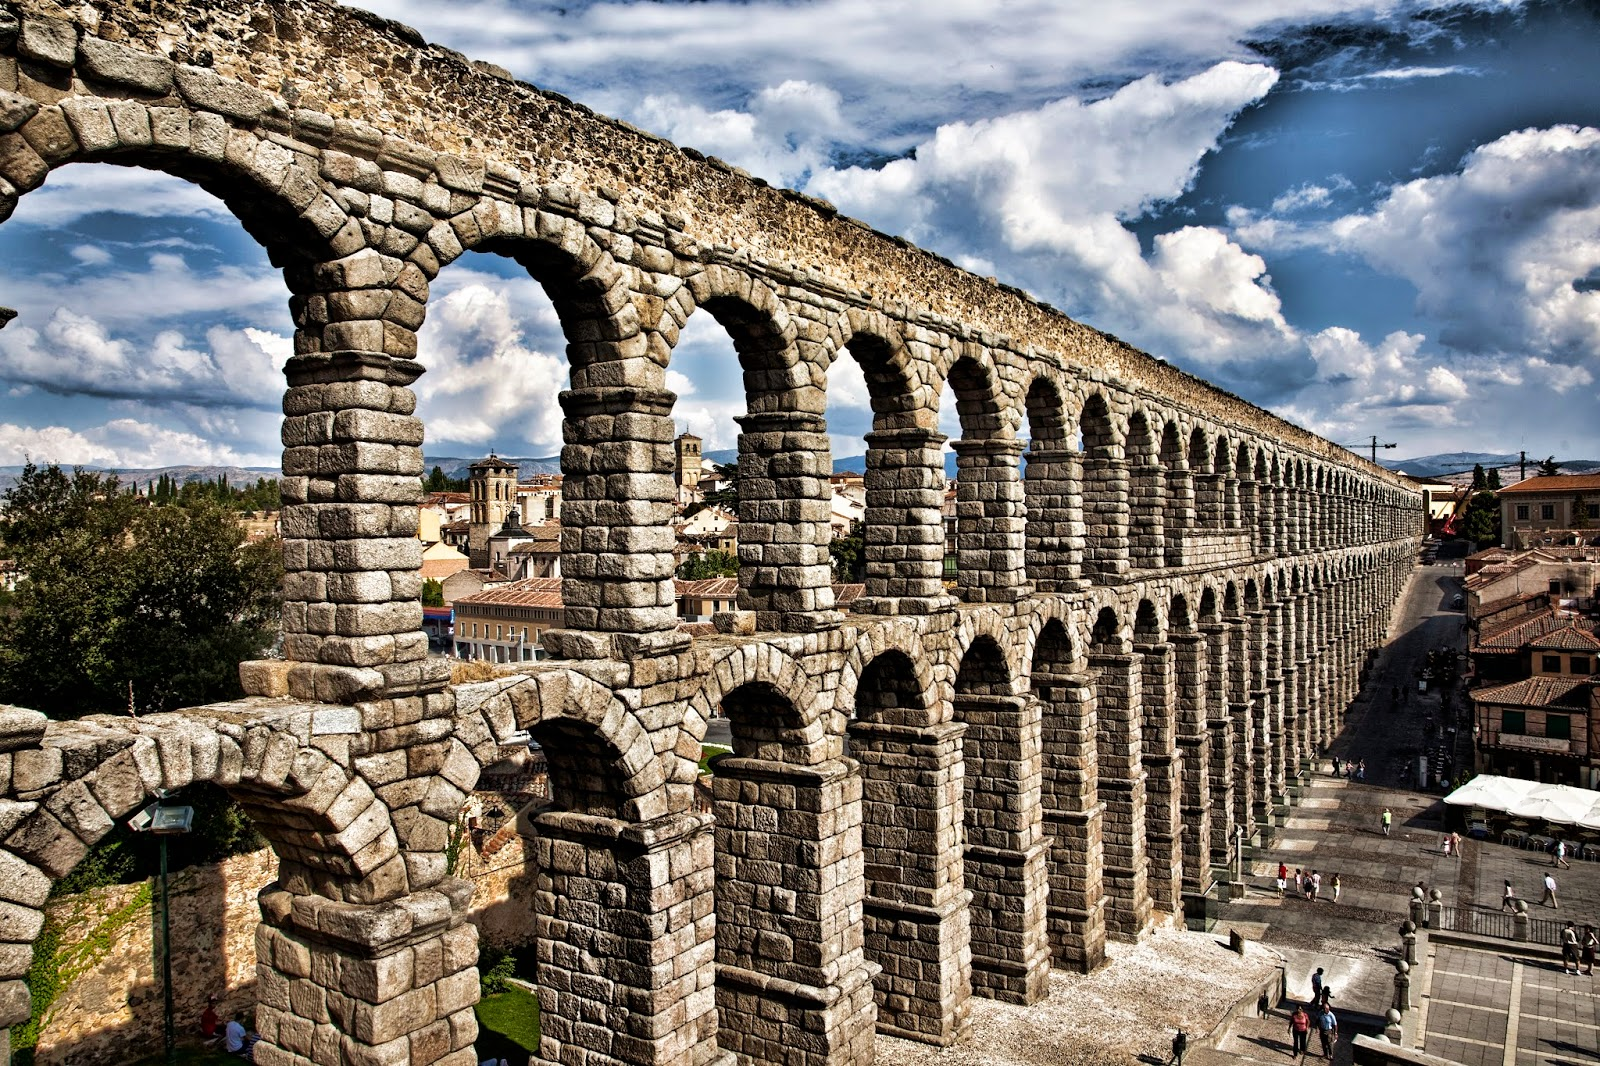 La romanizaci n legados de la antigua roma arquitectura for Articulos de arquitectura 2015